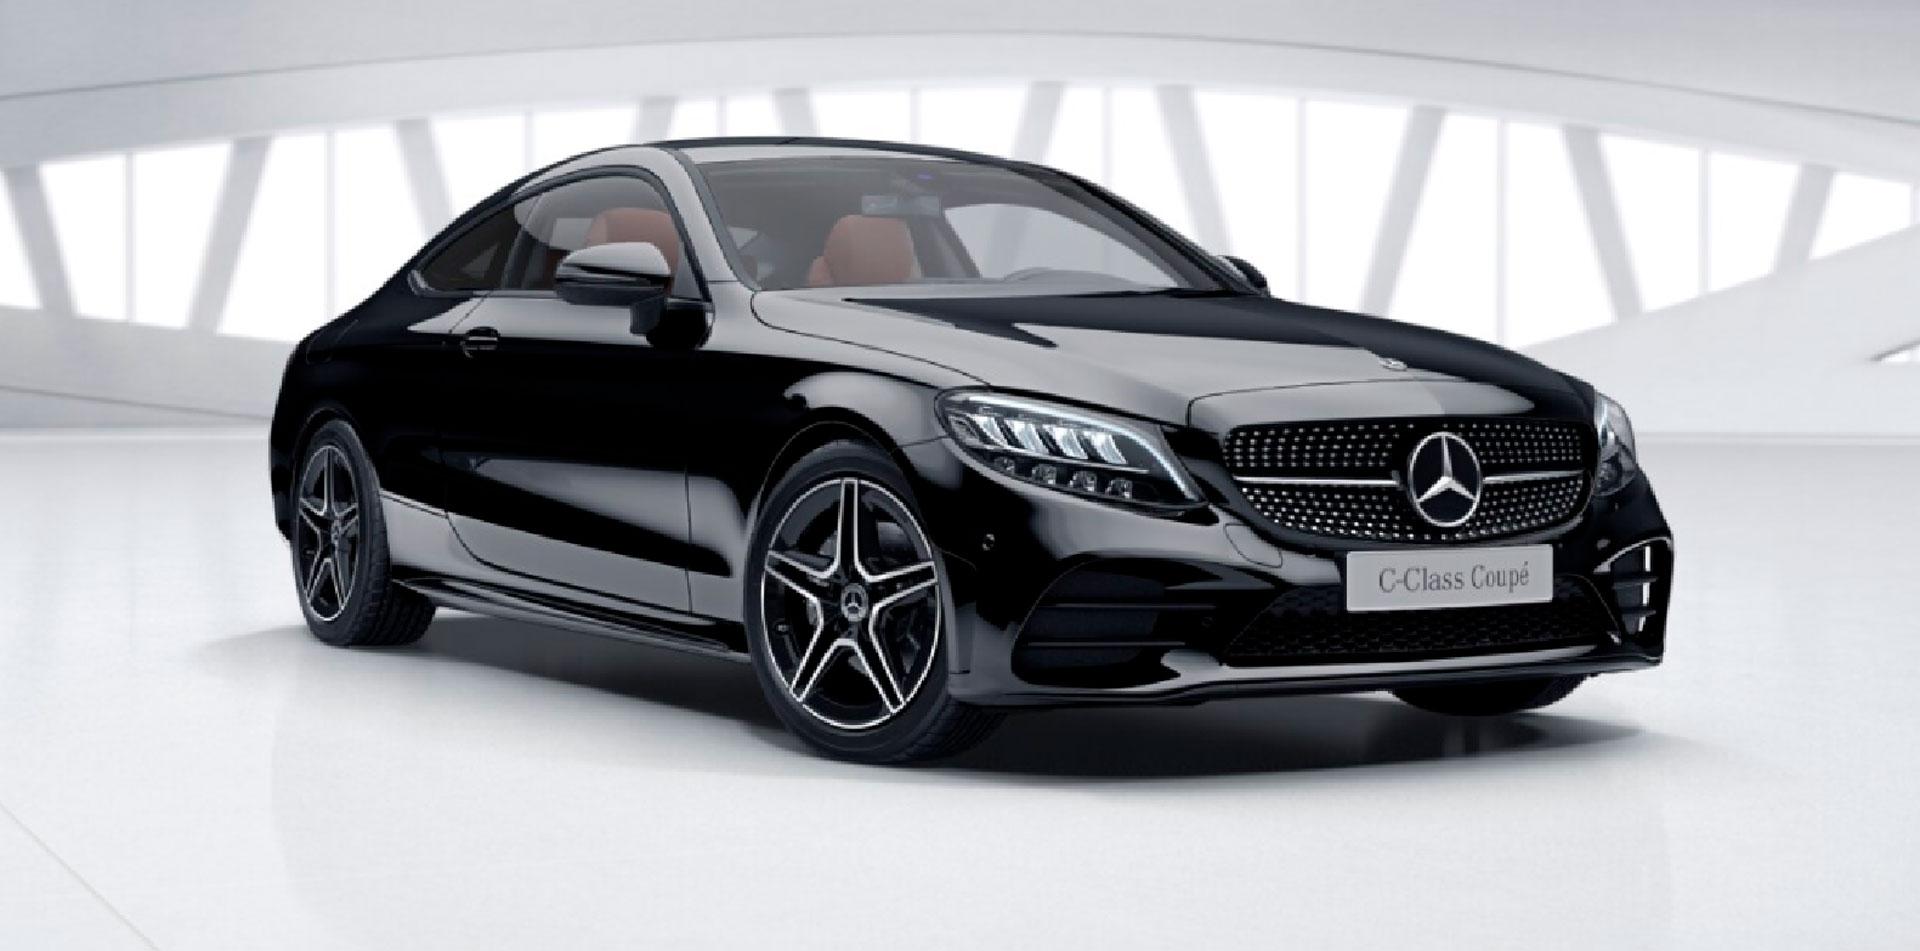 Mercedes-Benz C-Class Coupe 0152600182